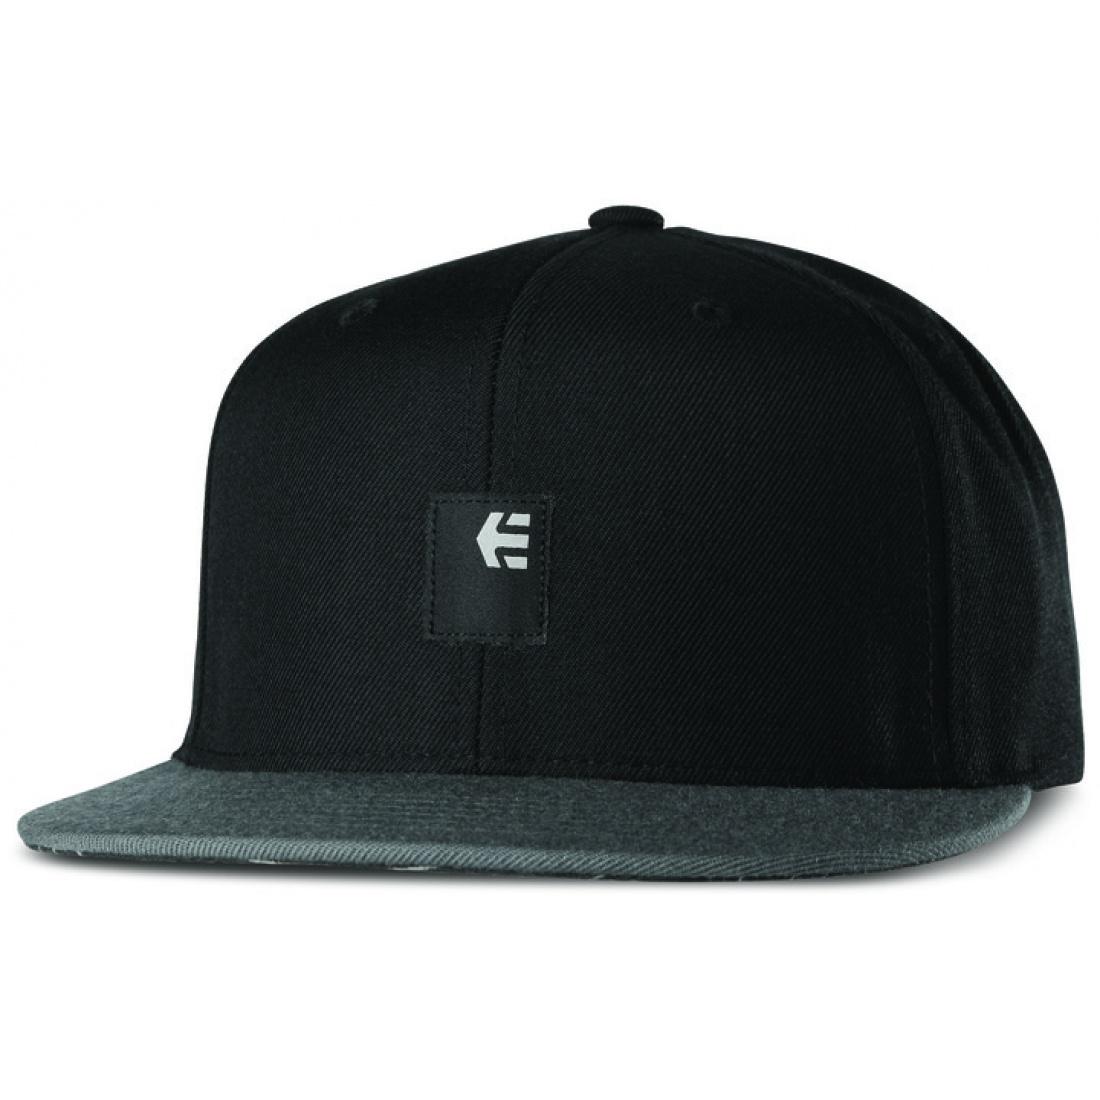 ETN-Half Dome Black Hat